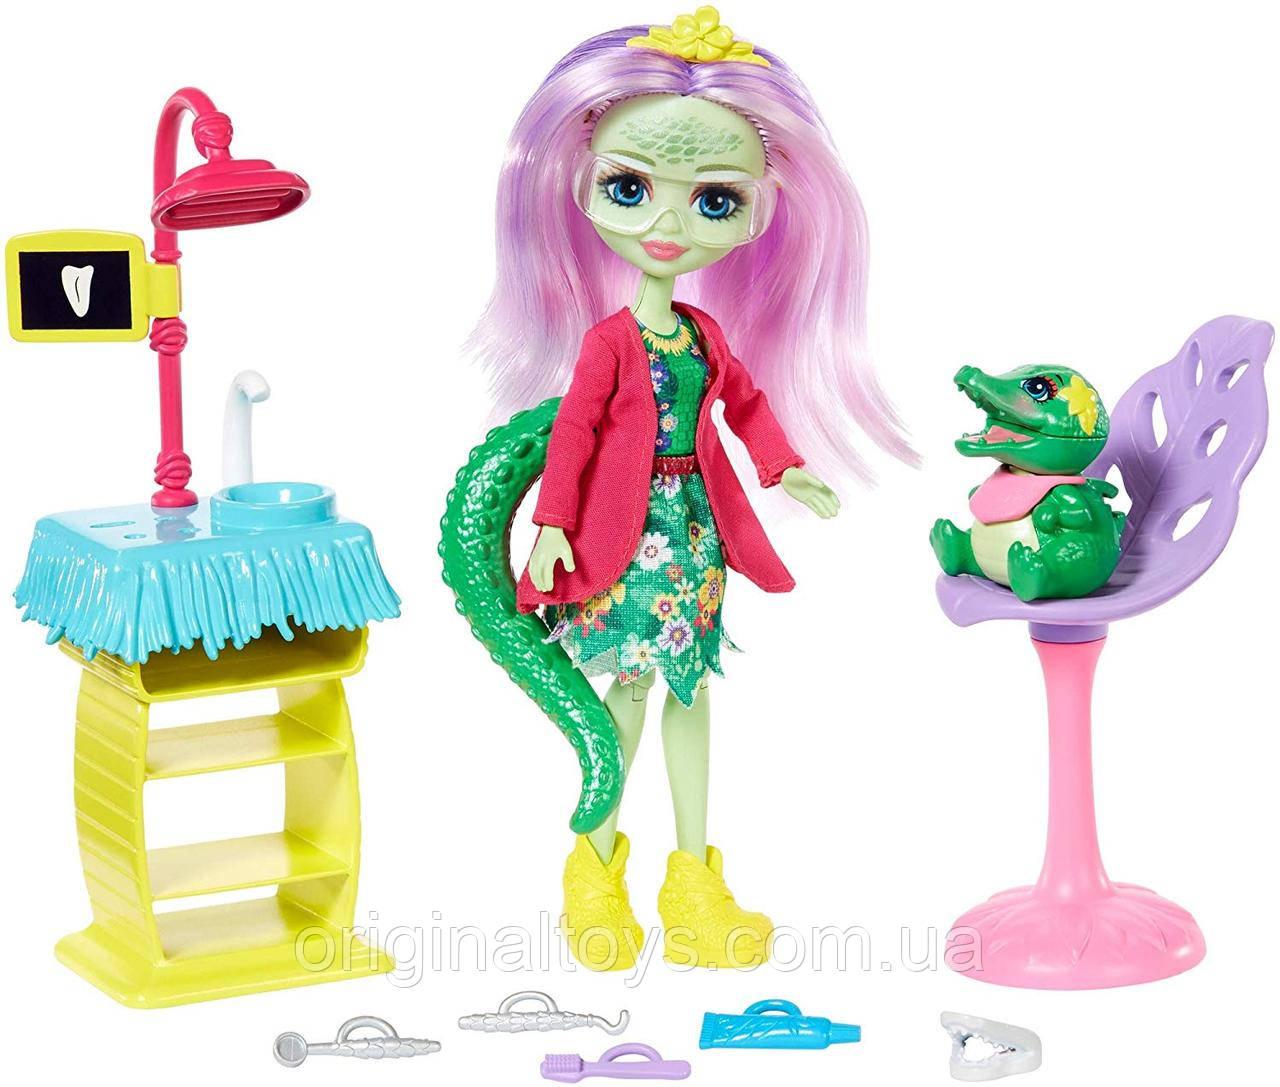 Набор Enchantimals кукла Стоматолог Аллигатор Энди и питомец